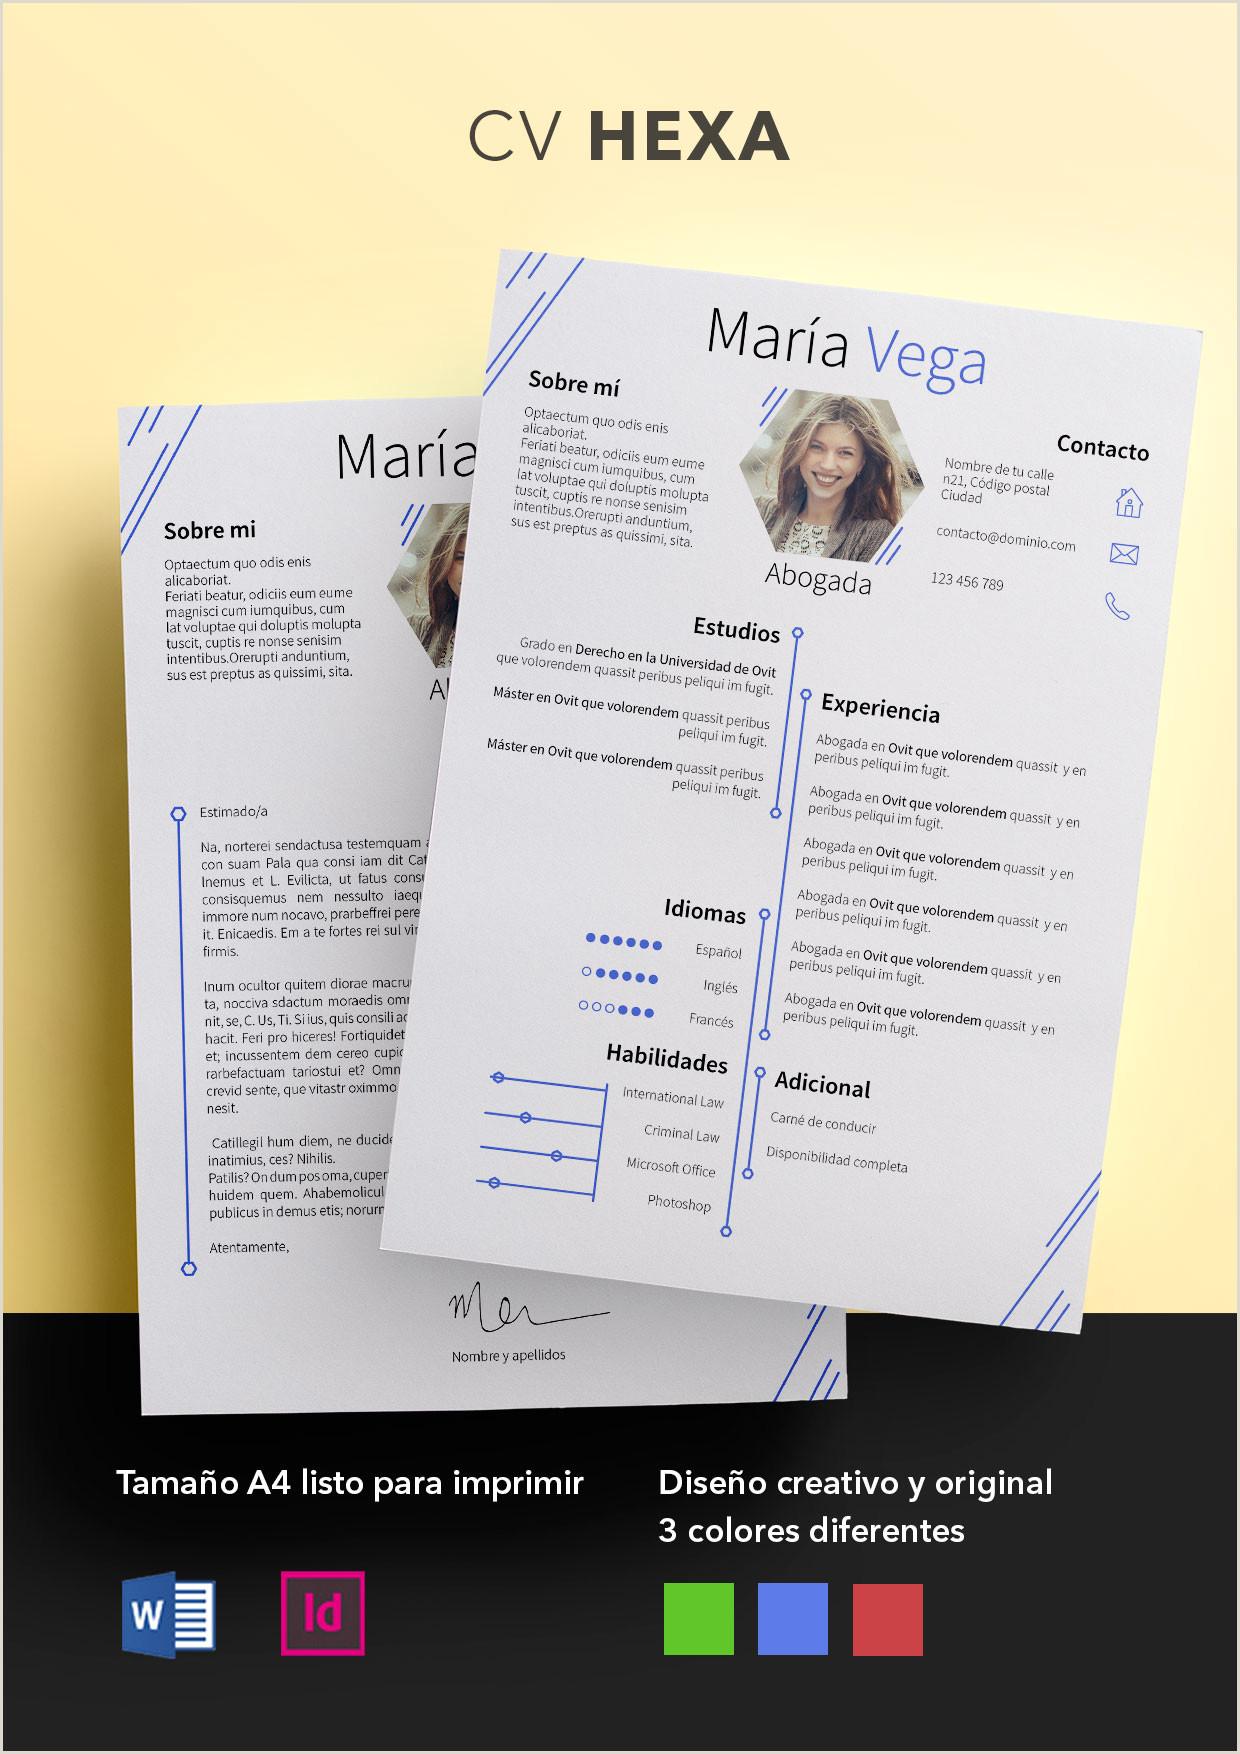 Formato De Curriculum Vitae Para Rellenar Con Foto Currculum Vitae Modelo Hexa